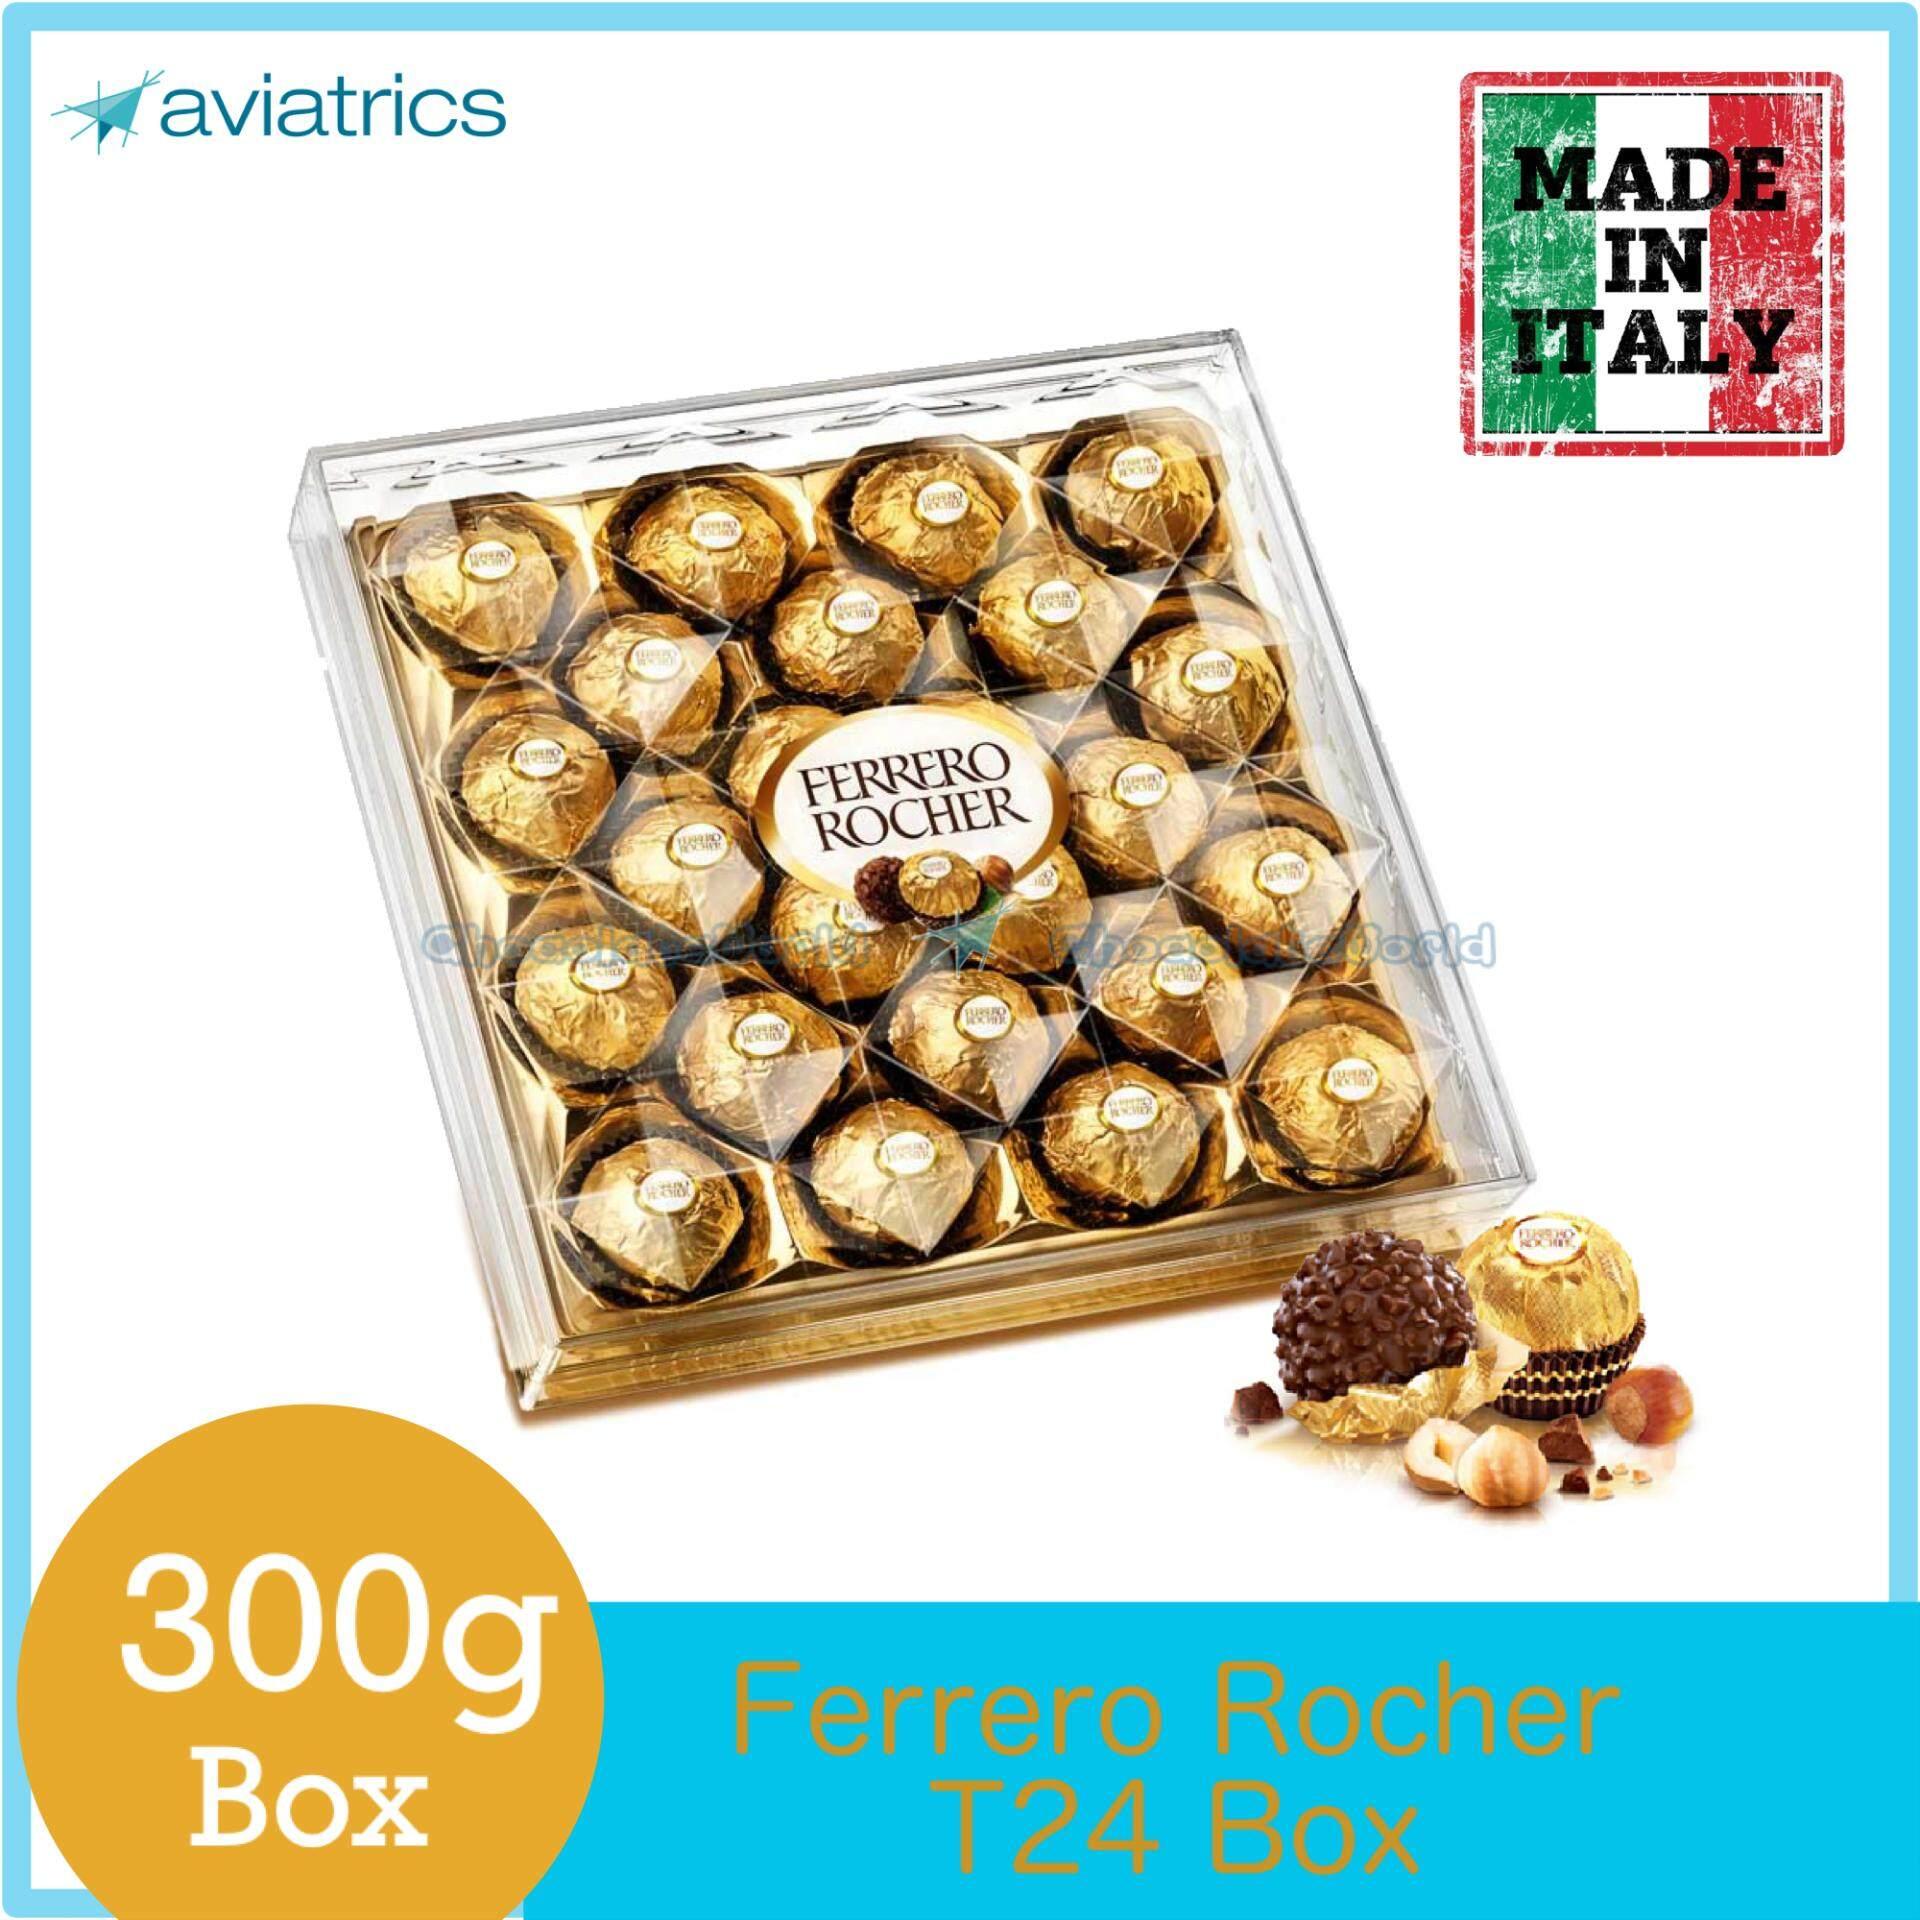 Ferrero Rocher 24T 300g (Made in Italy)